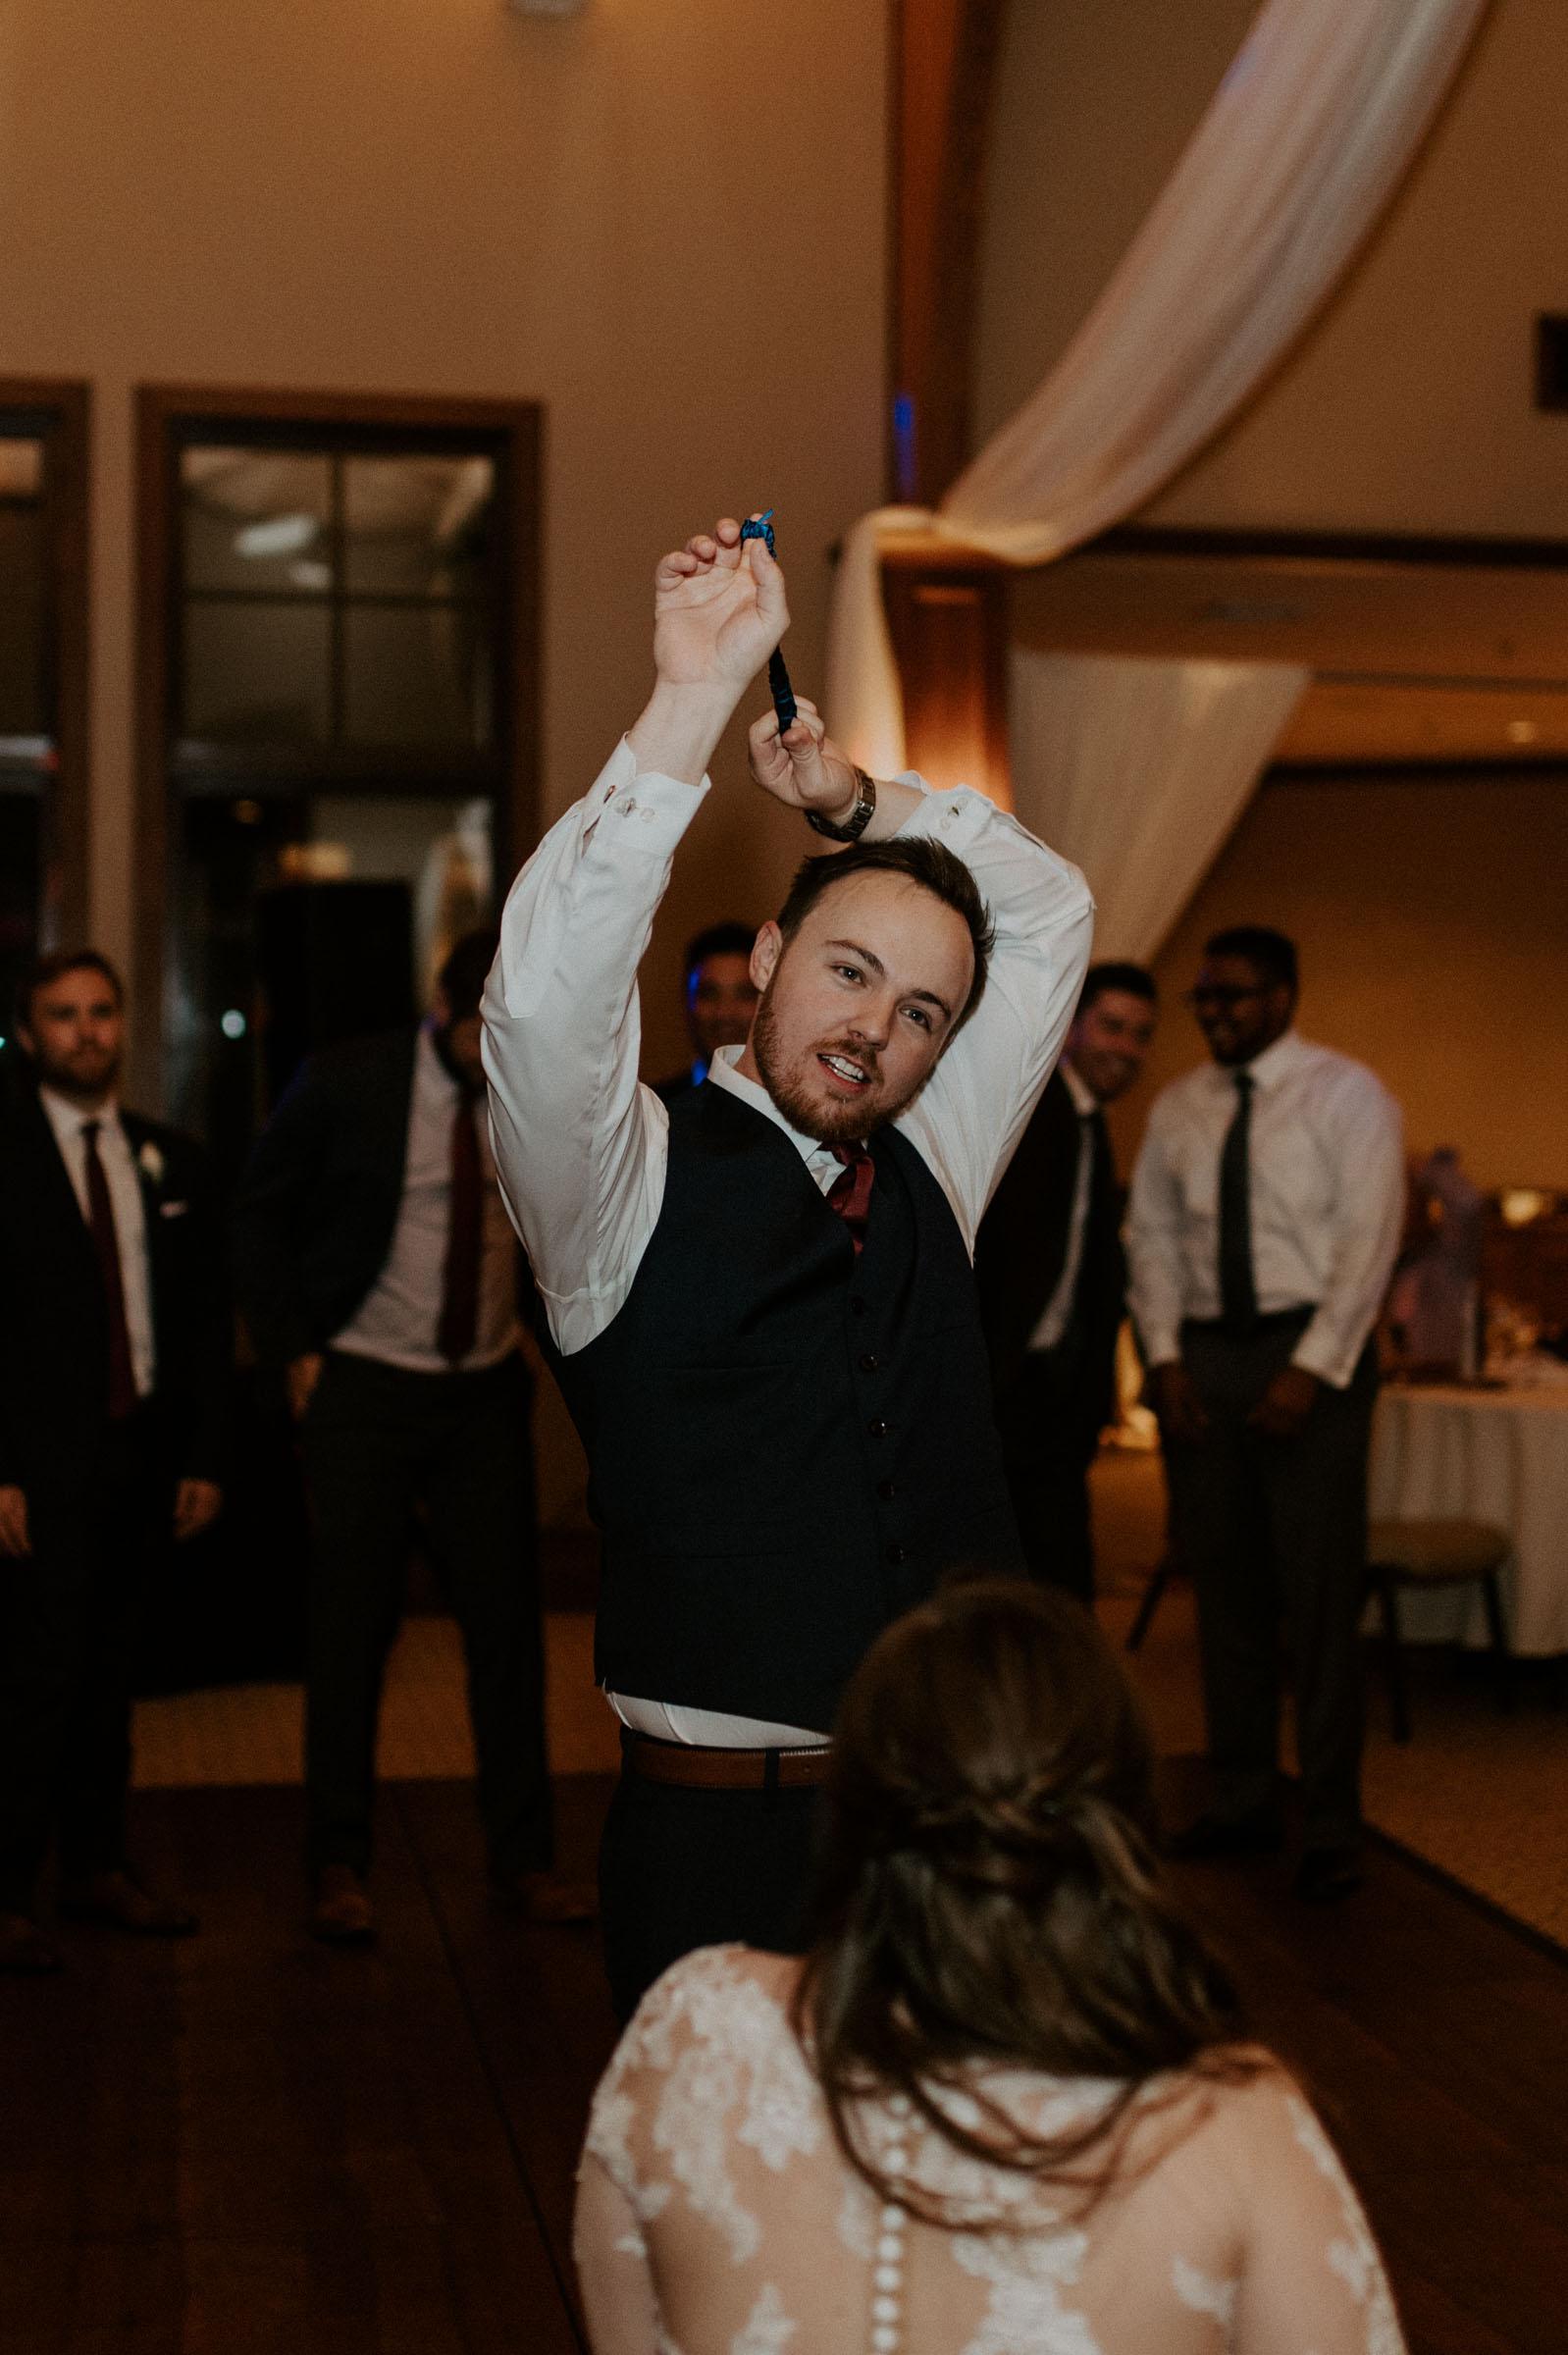 groom taking off garter during wedding reception